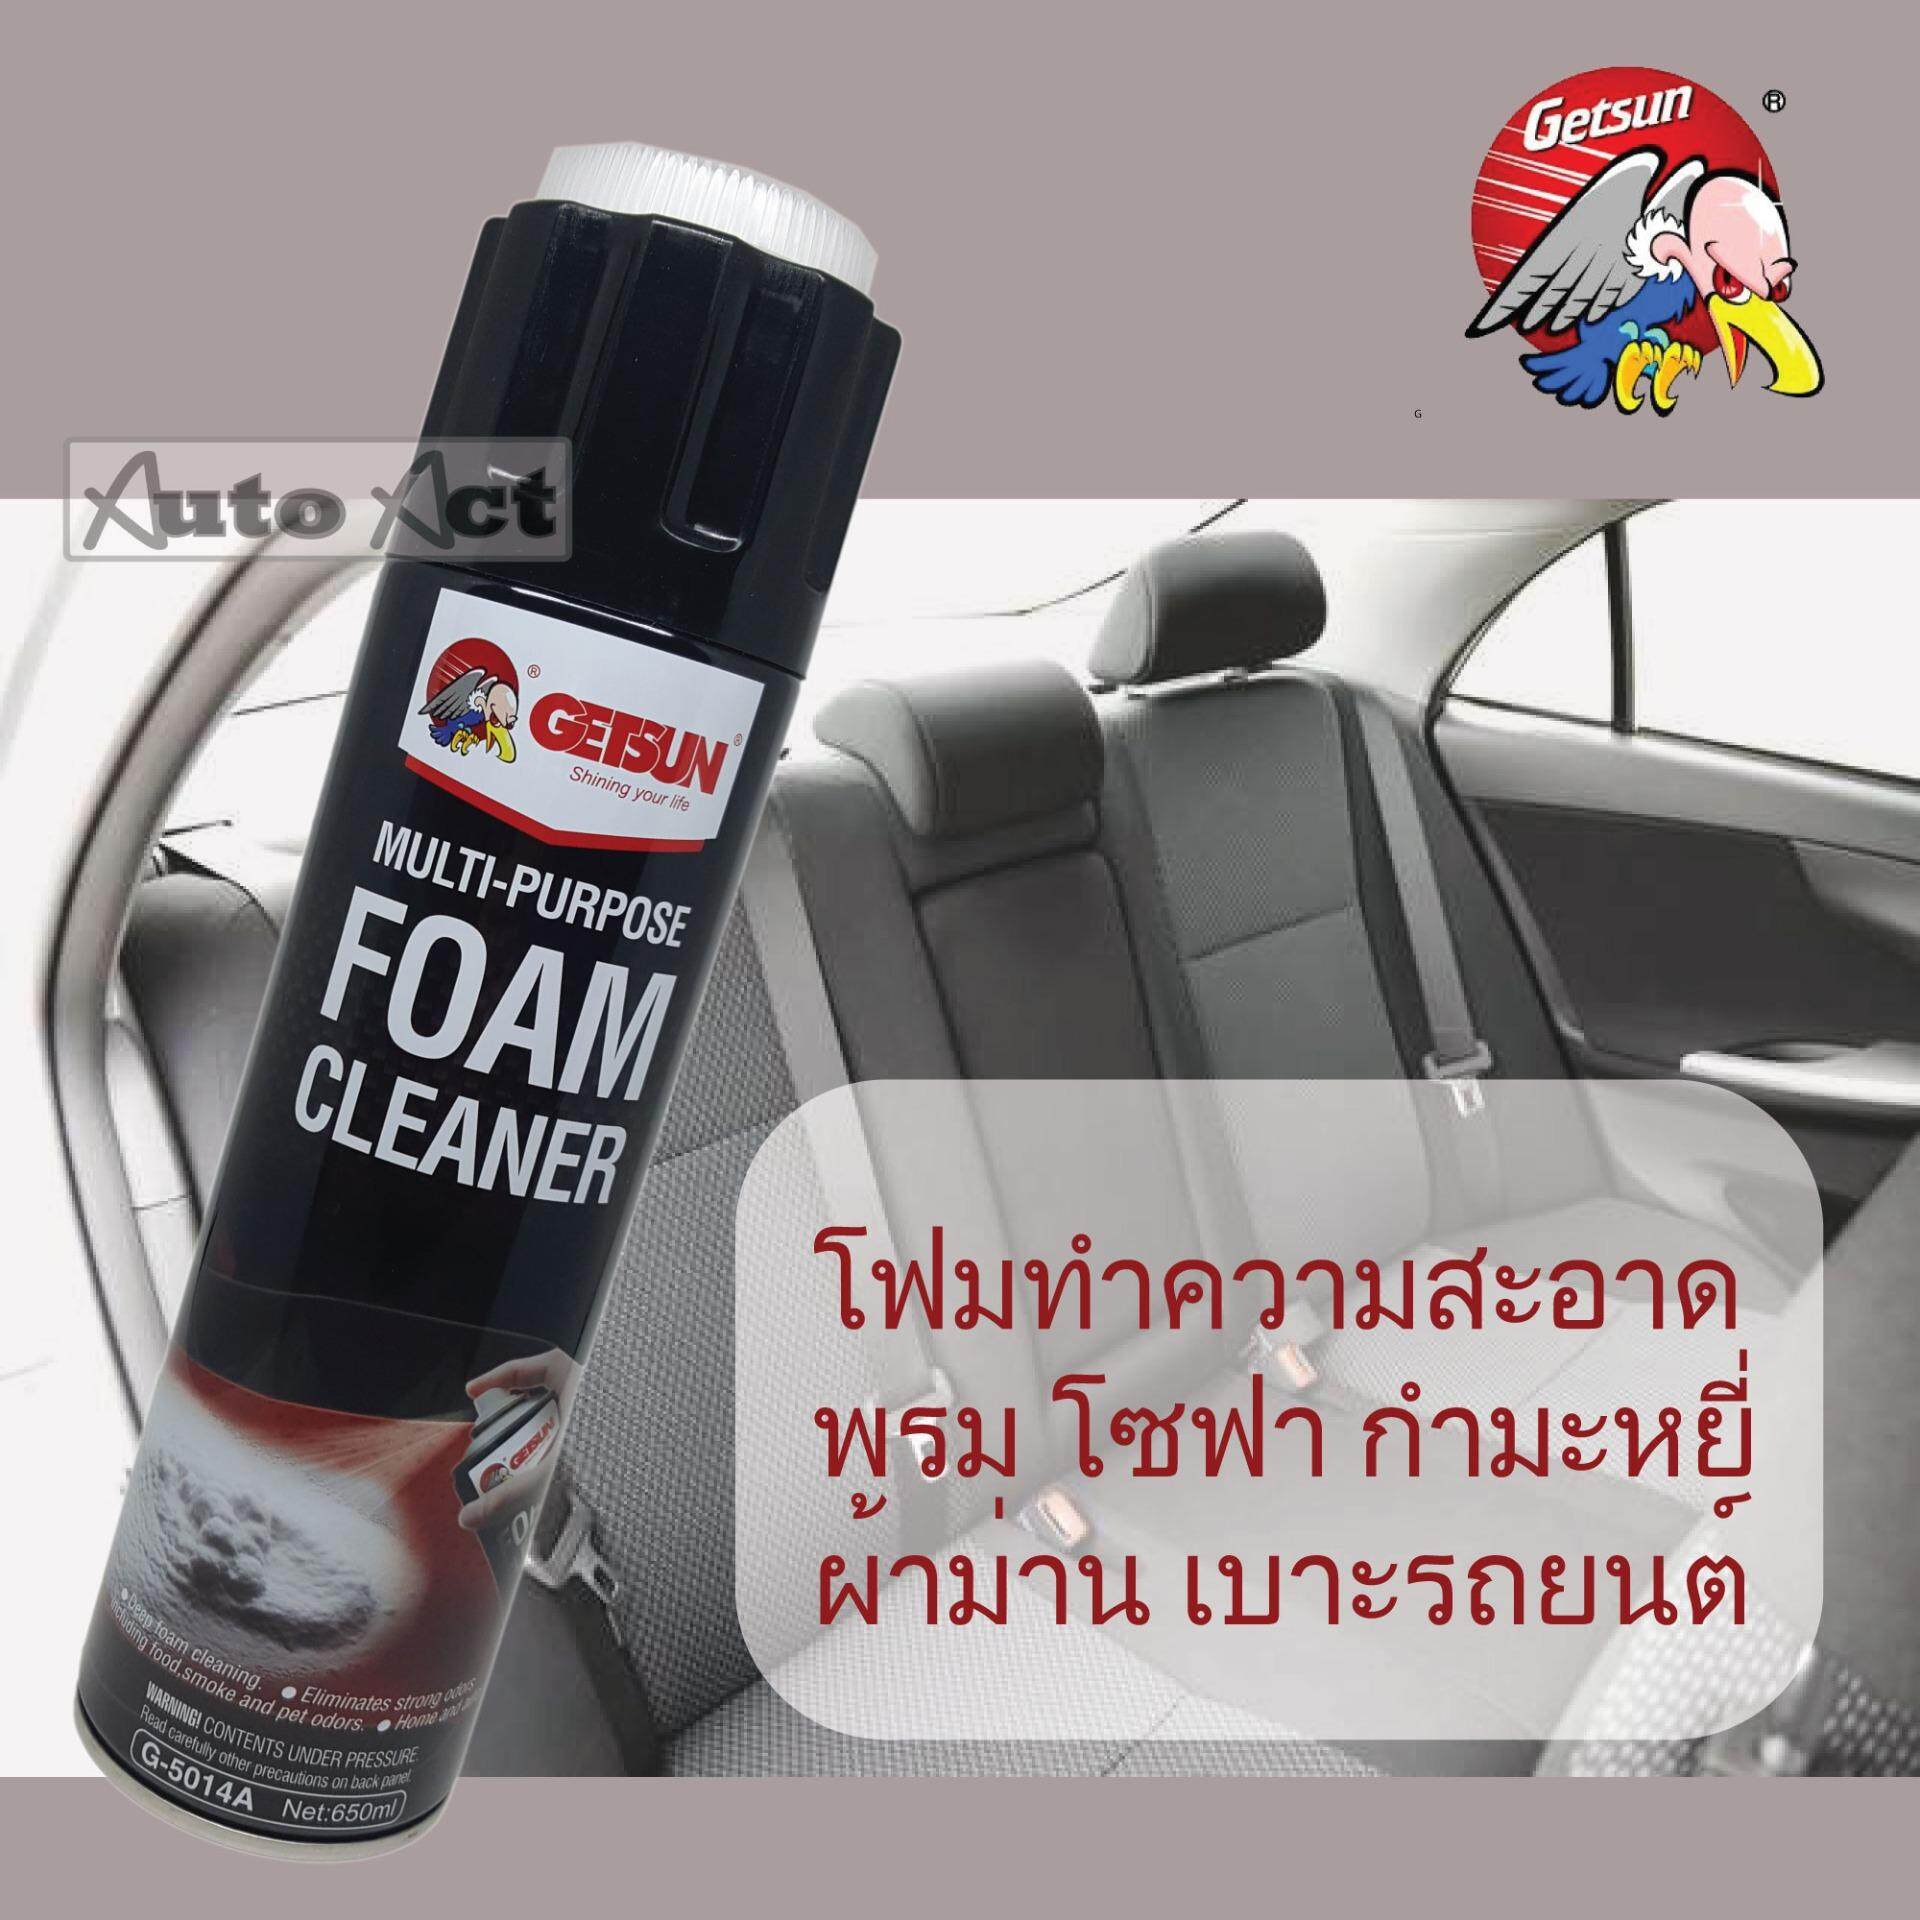 Getsun Foam Cleaner สเปรย์โฟมอเนกประสงค์ ทำความสะอาด พรม ผ้า กำมะหยี่ โซฟา รองเท้าผ้าใบ โฟมซักพรม By Auto Act.